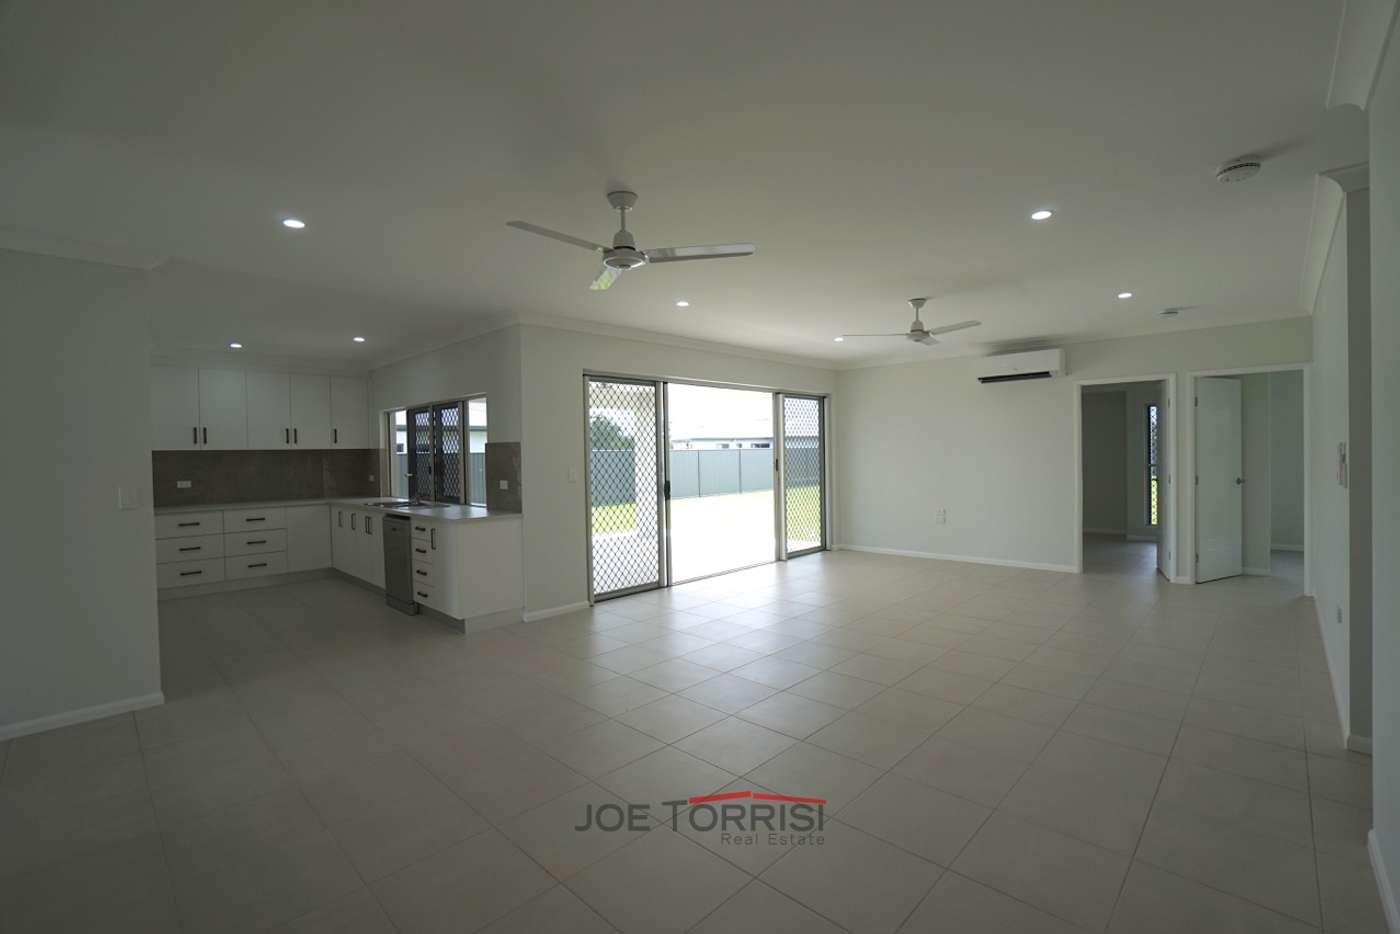 Fifth view of Homely house listing, 12 Moondani Avenue, Mareeba QLD 4880